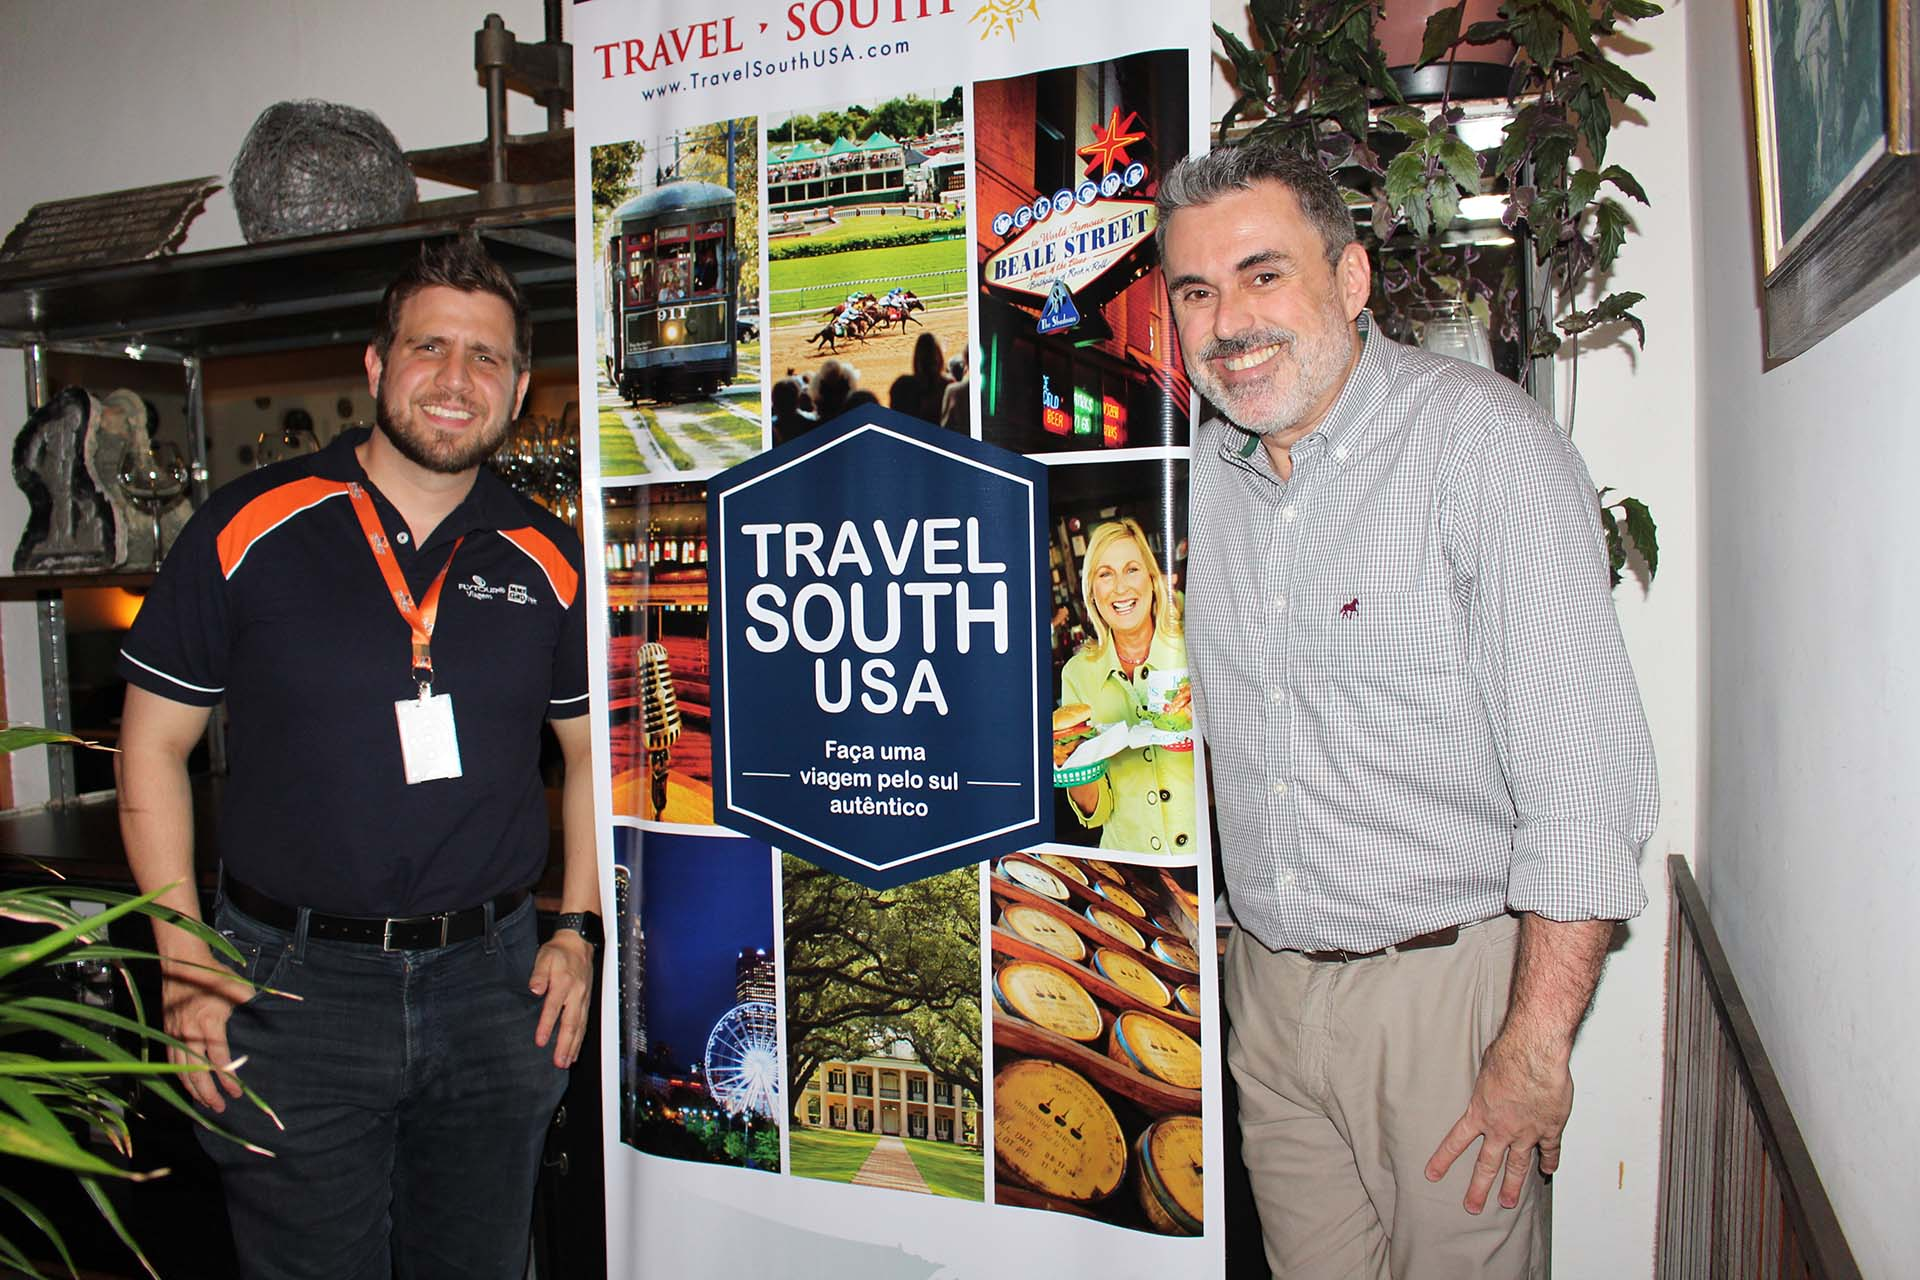 Travel South USA Flytour MMT Viagens